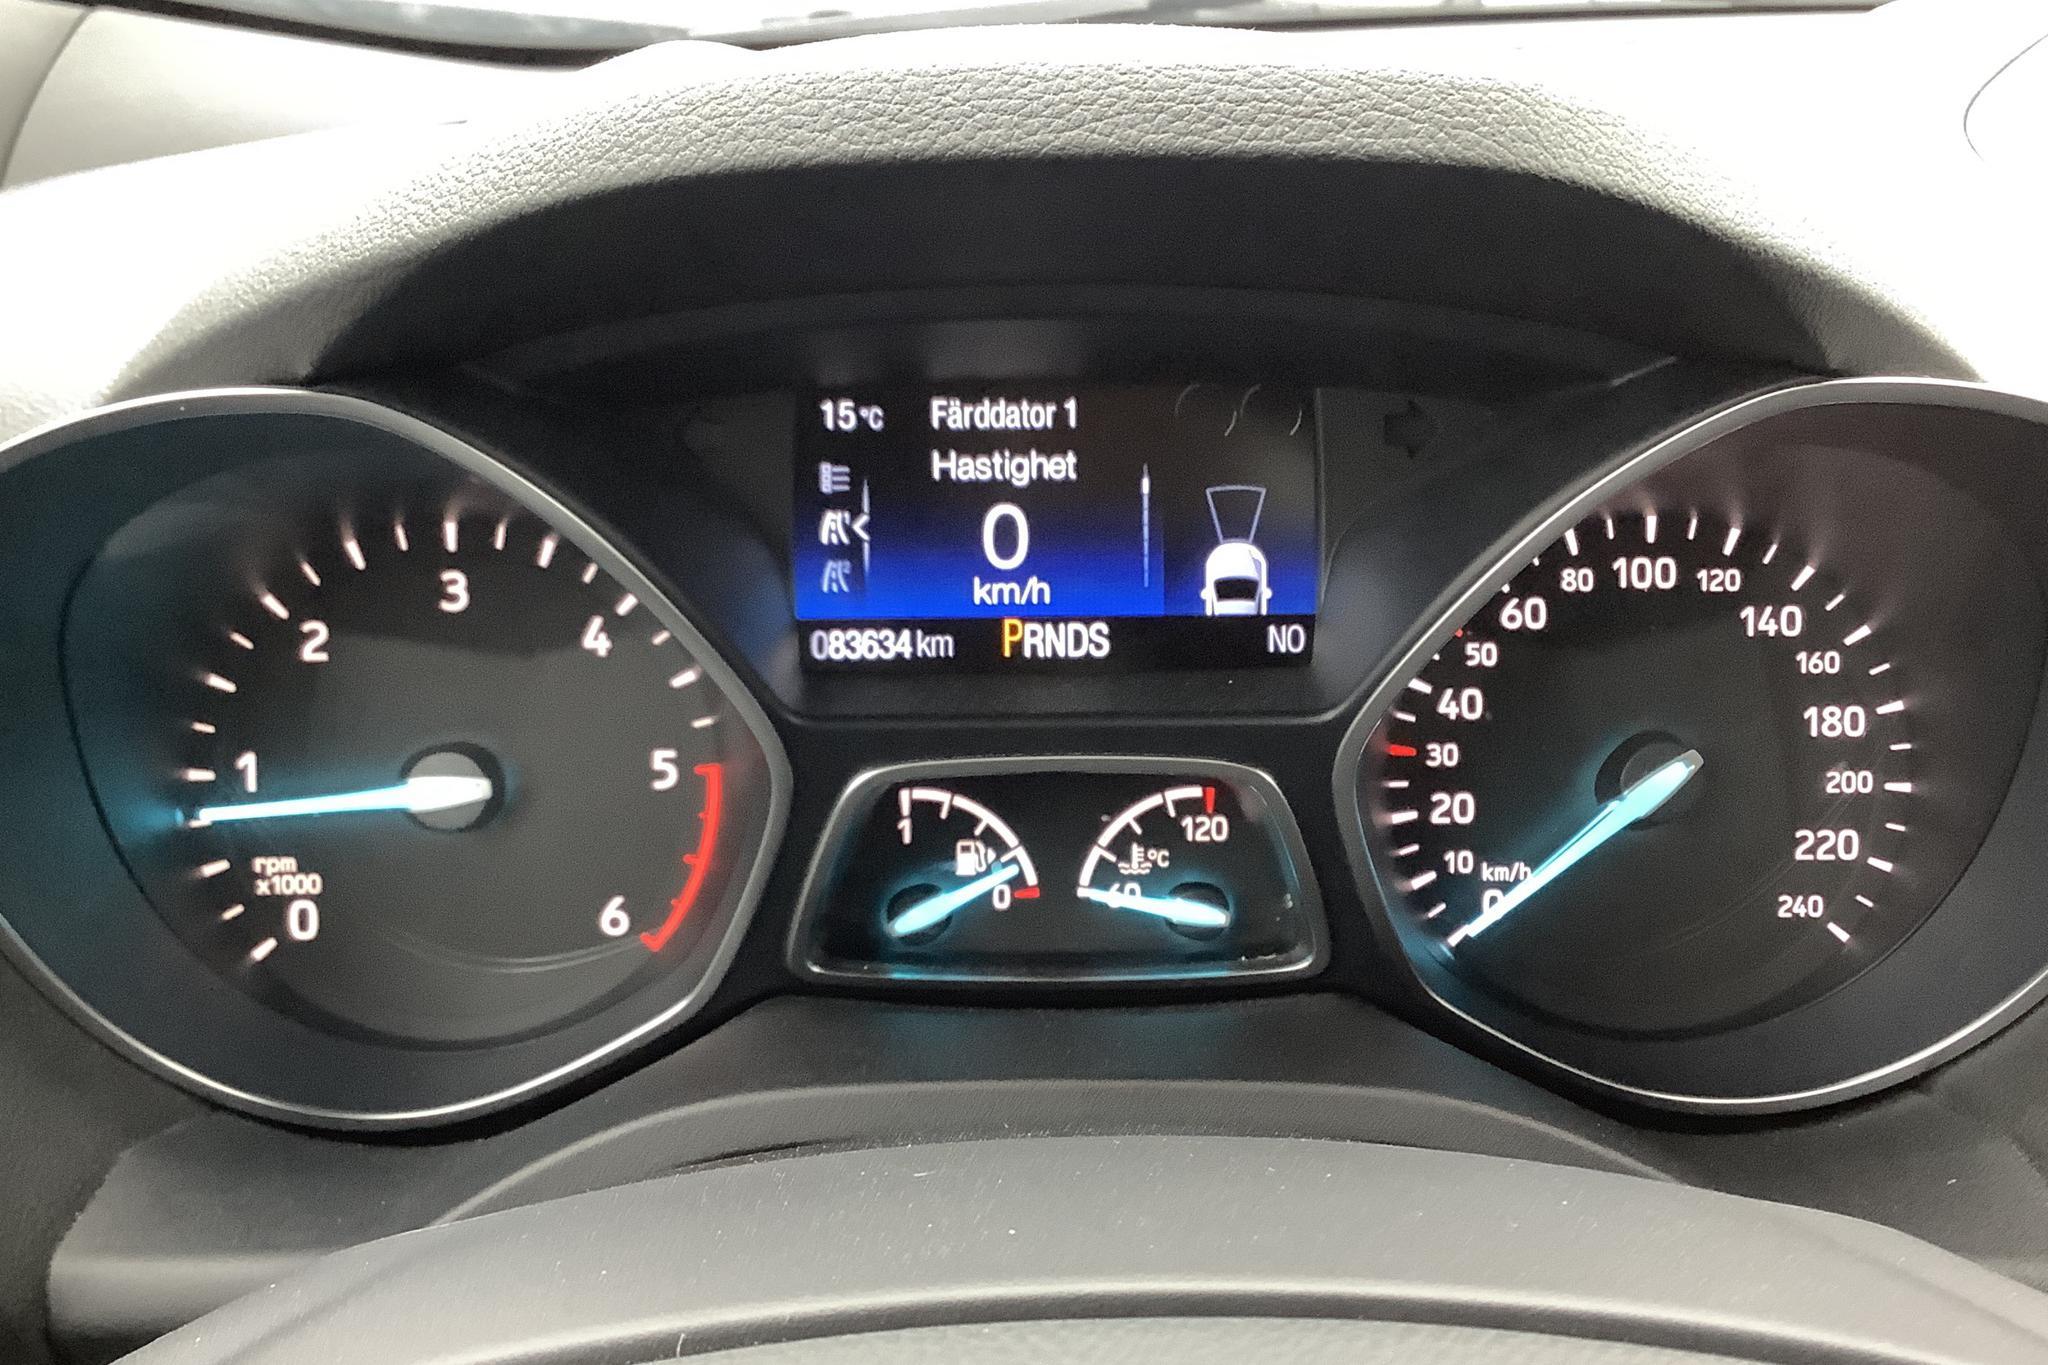 Ford Kuga 2.0 TDCi AWD (180hk) - 8 363 mil - Automat - svart - 2017